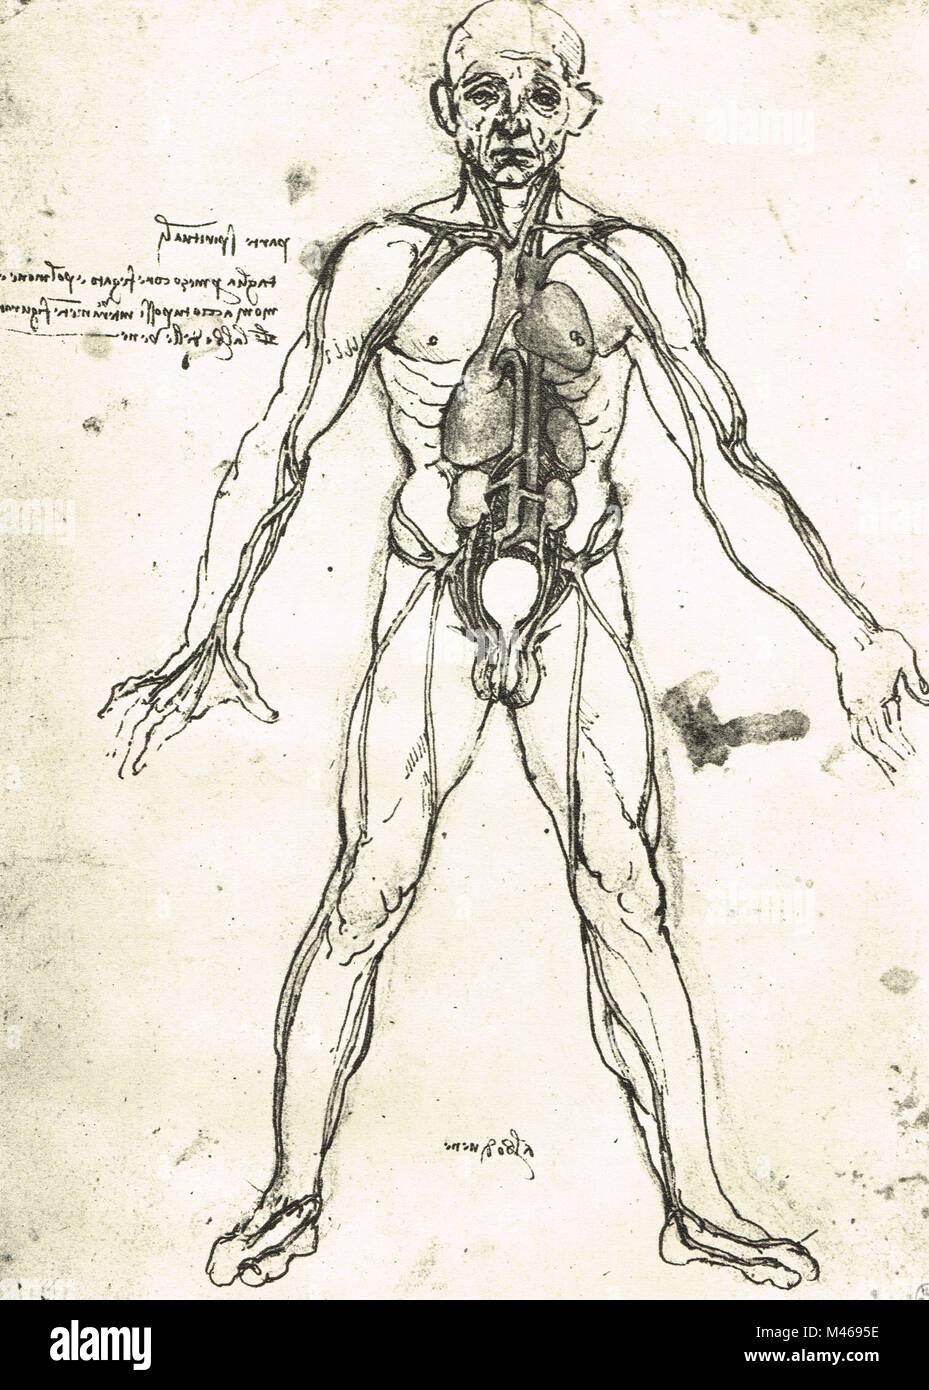 Drawn By Leonardo Da Vinci Stockfotos & Drawn By Leonardo Da Vinci ...